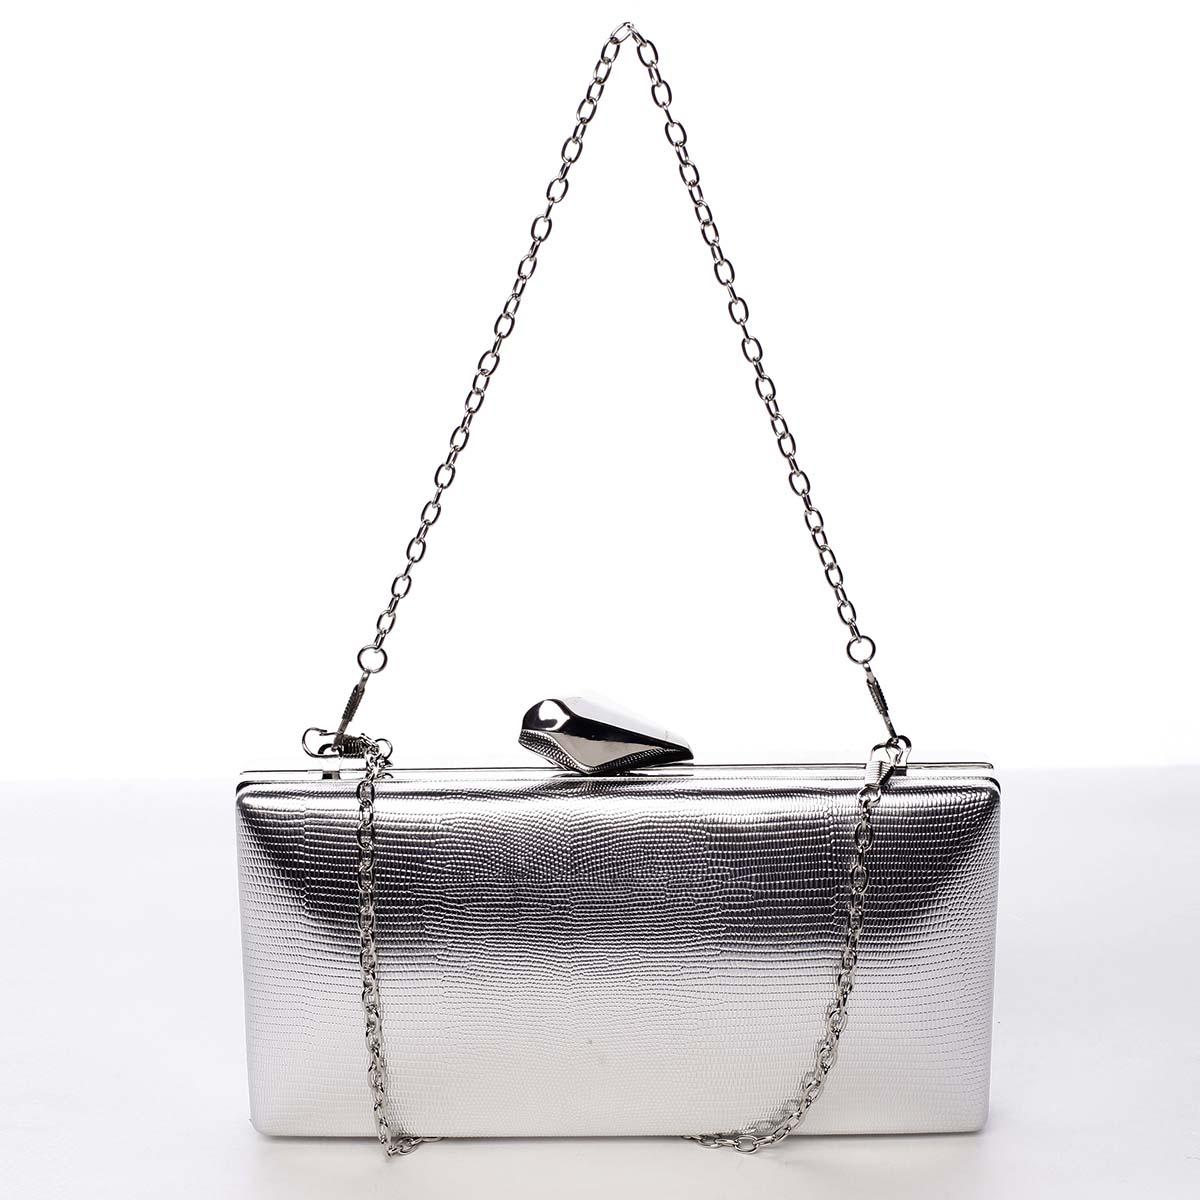 Dámská listová kabelka strieborná - Michelle Moon Elegance